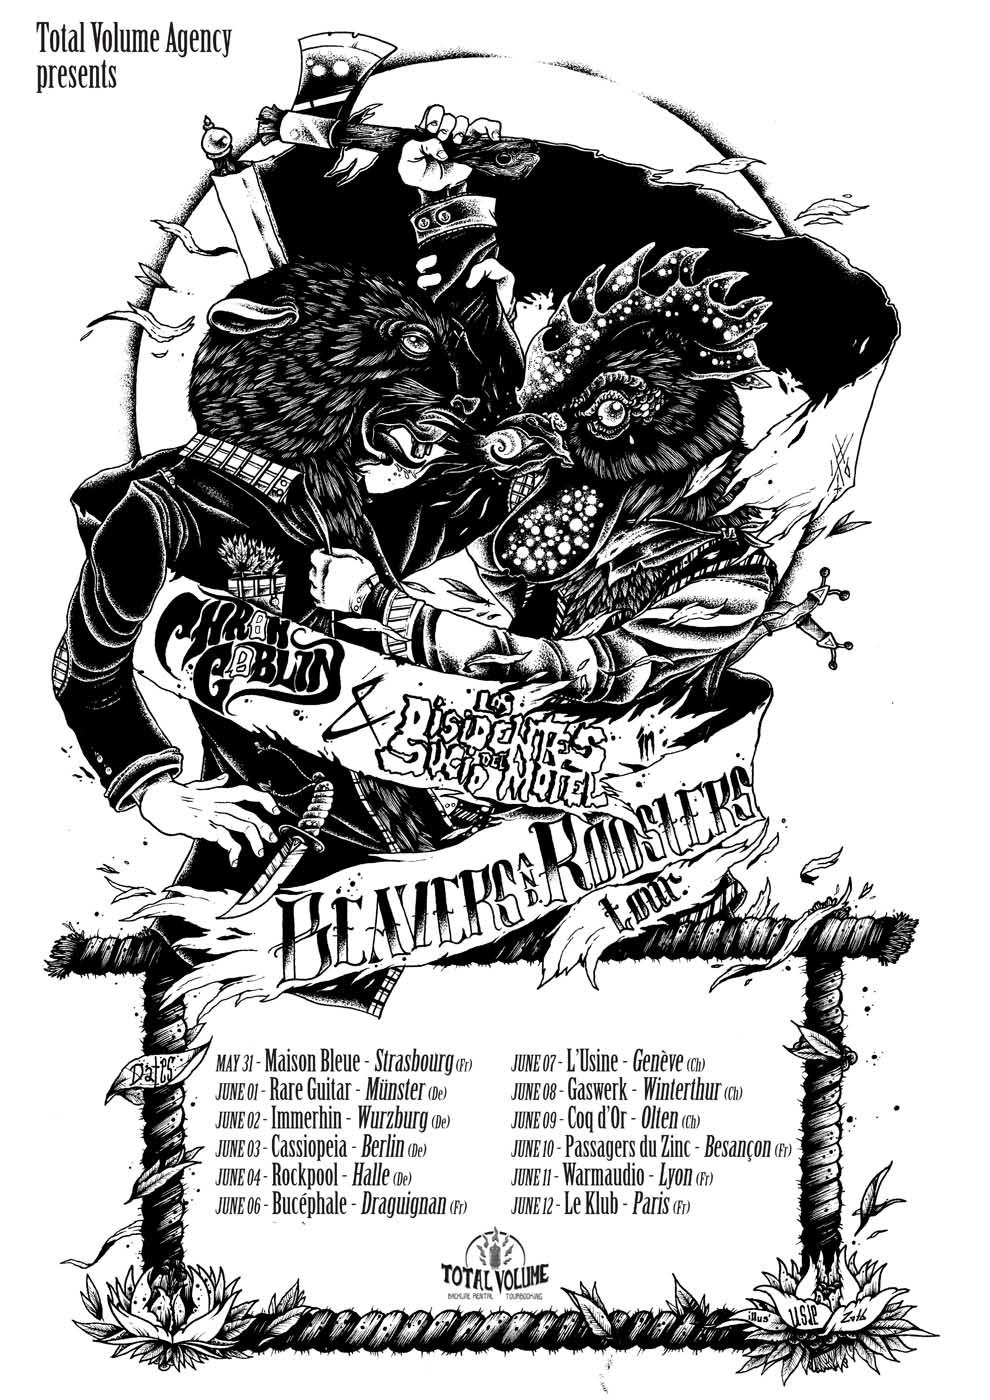 chron-goblin-los-disidentes del sucio motel tour